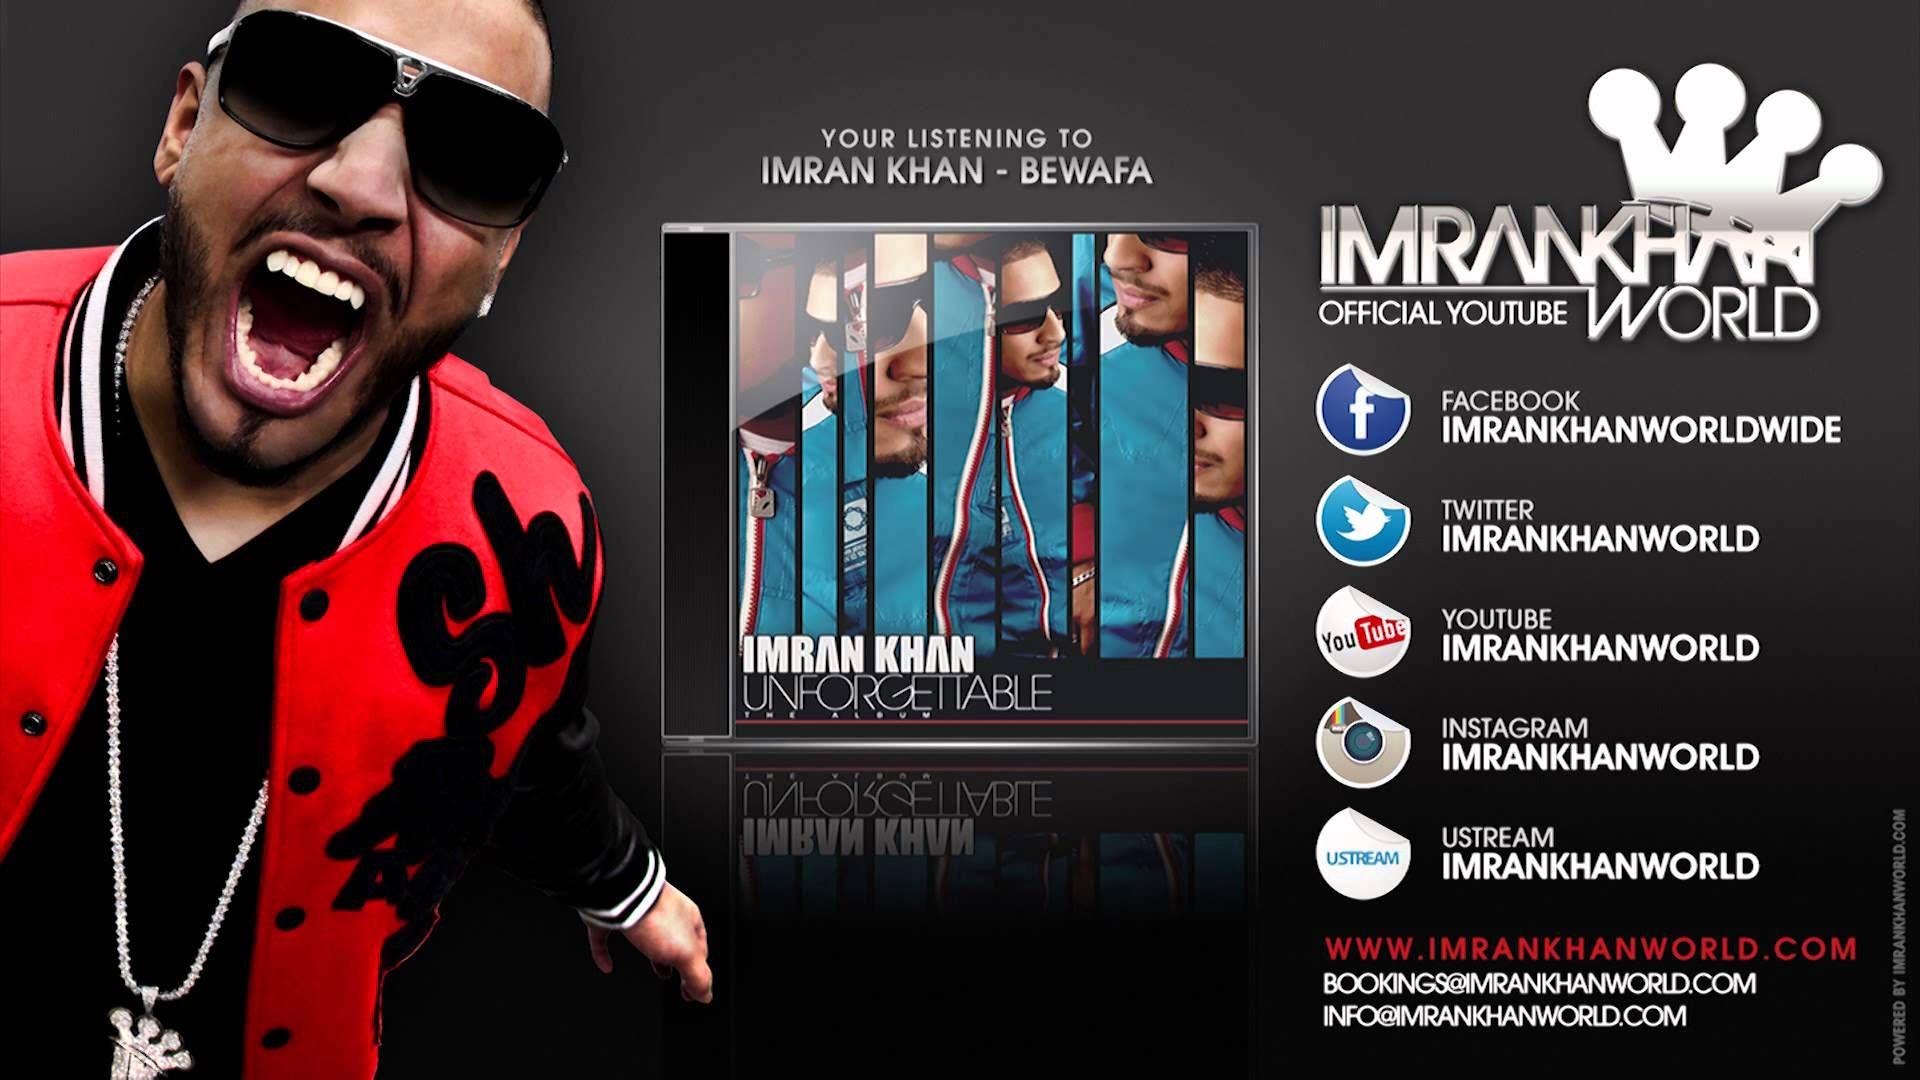 Imran Khan Bewafa Official Song Imran Khan Imran Khan Singer Songs